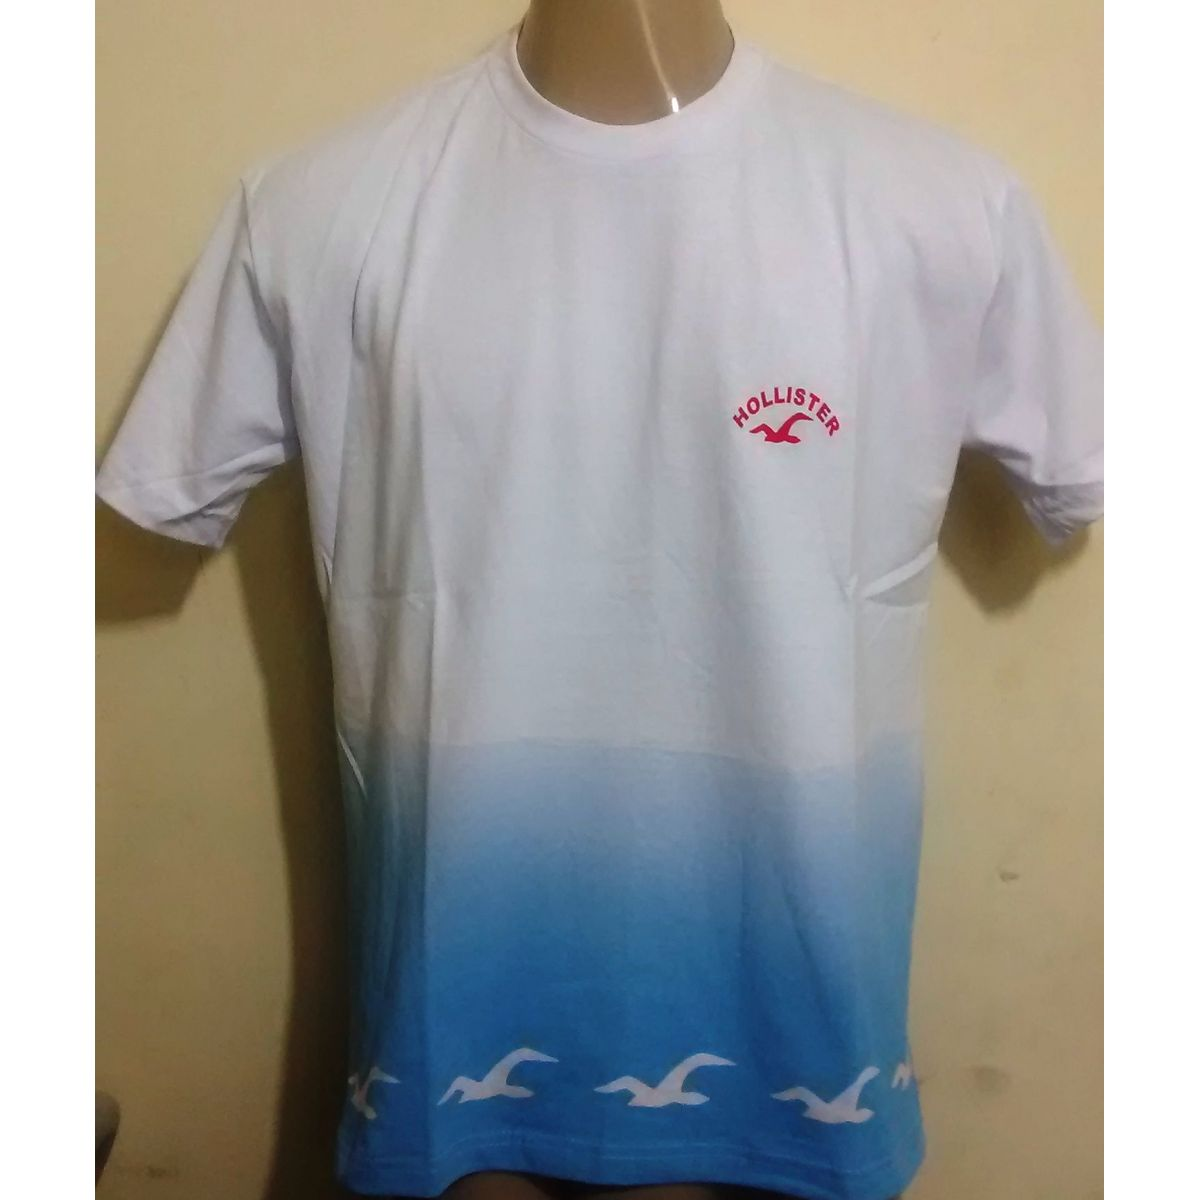 Kit C/ 40 Camisetas Masculinas Degrade Diversas Marcas